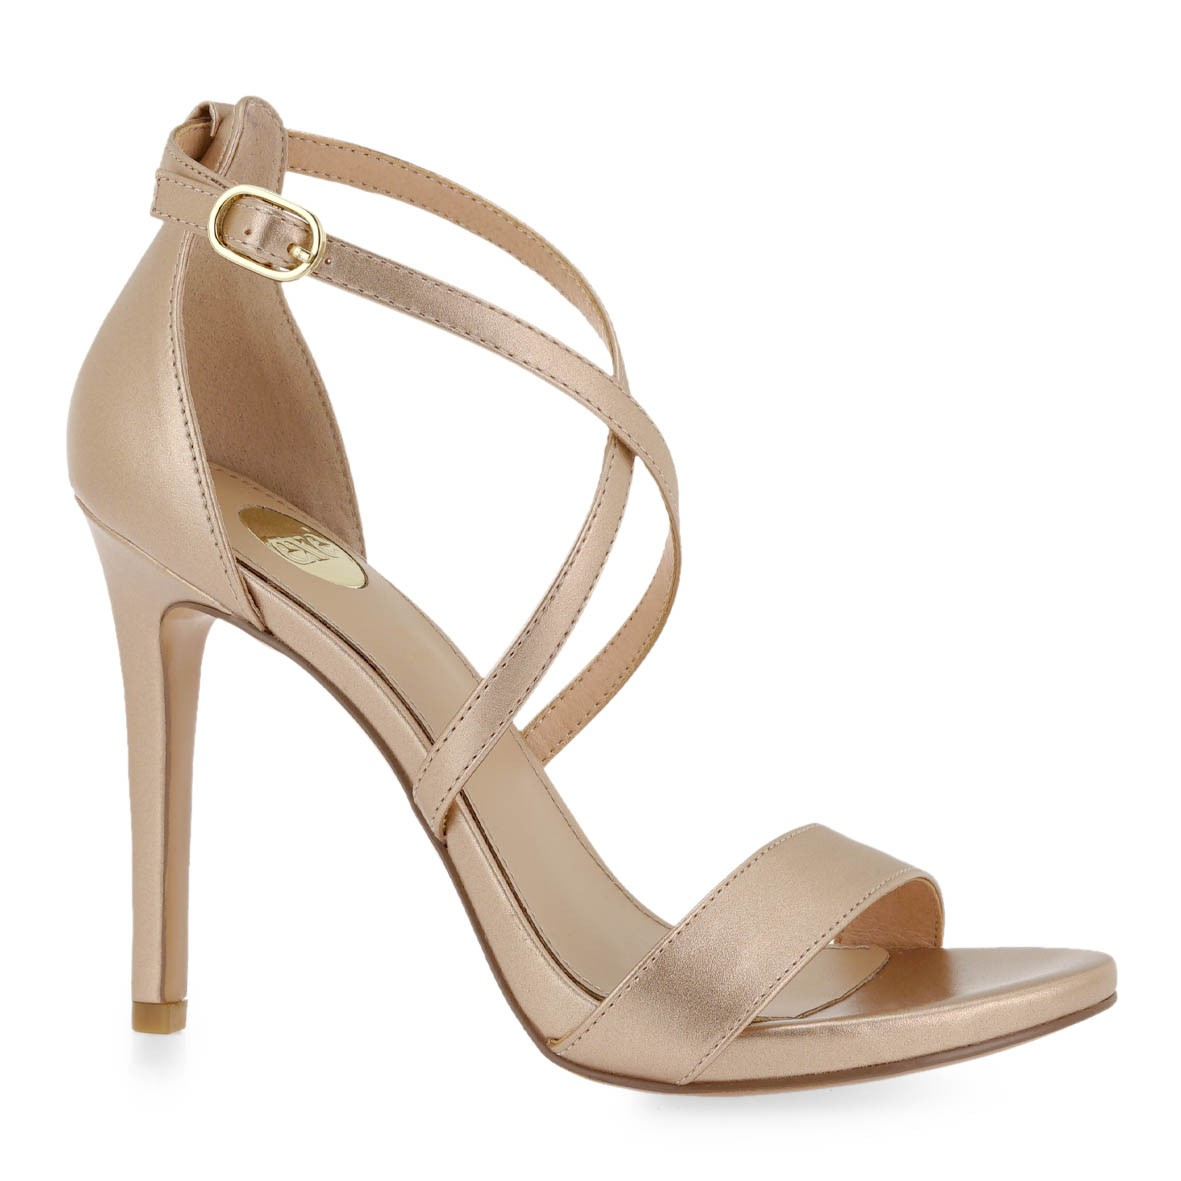 EXE Shoes Πέδιλα Γυναικεία SILVIA-923 Ρόζ Χρυσός K47009236546